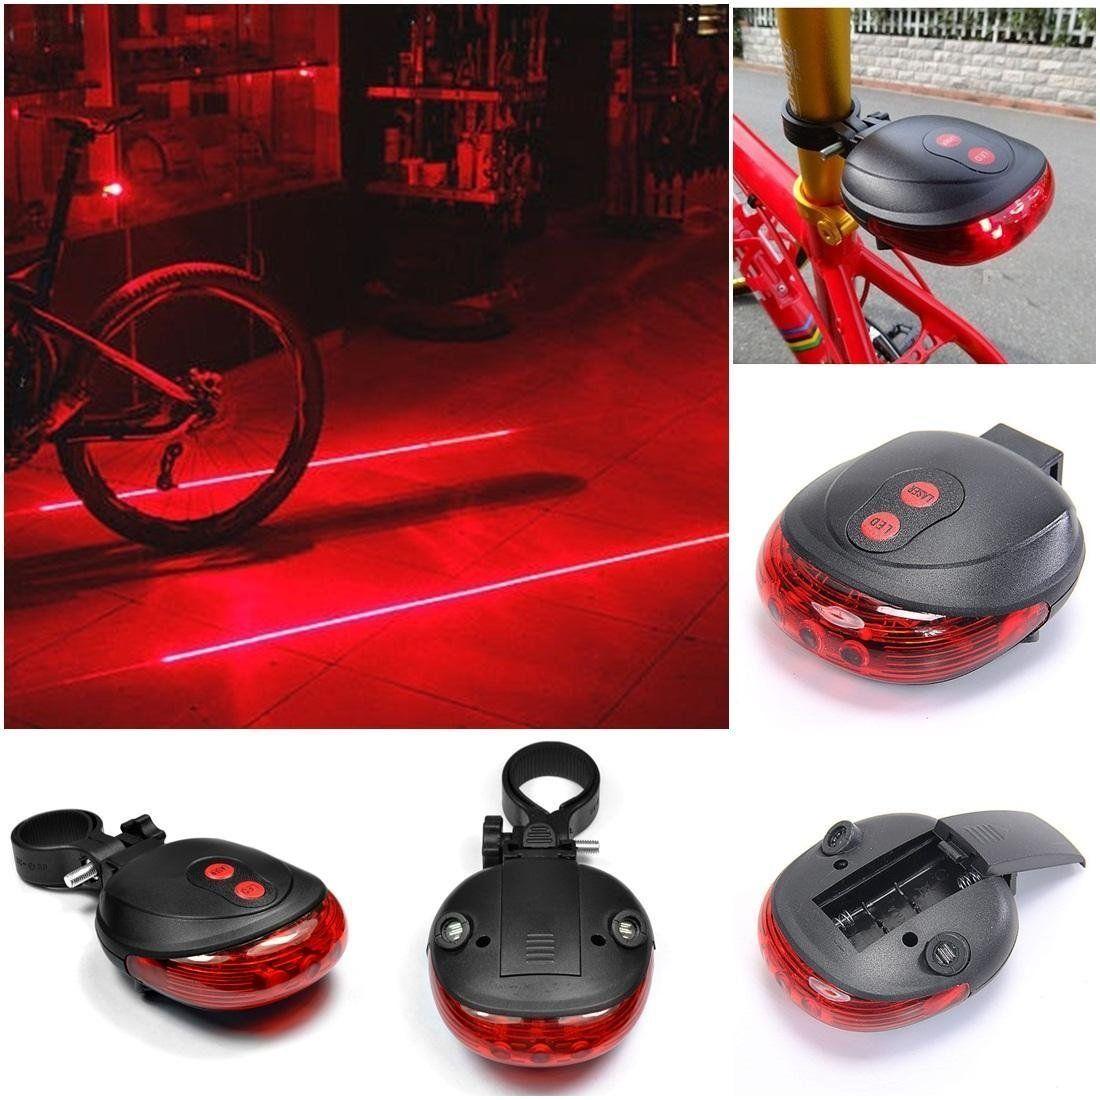 LED Bike Tail Light Tail Warning Light Rear Light Safety For Household Outdoor